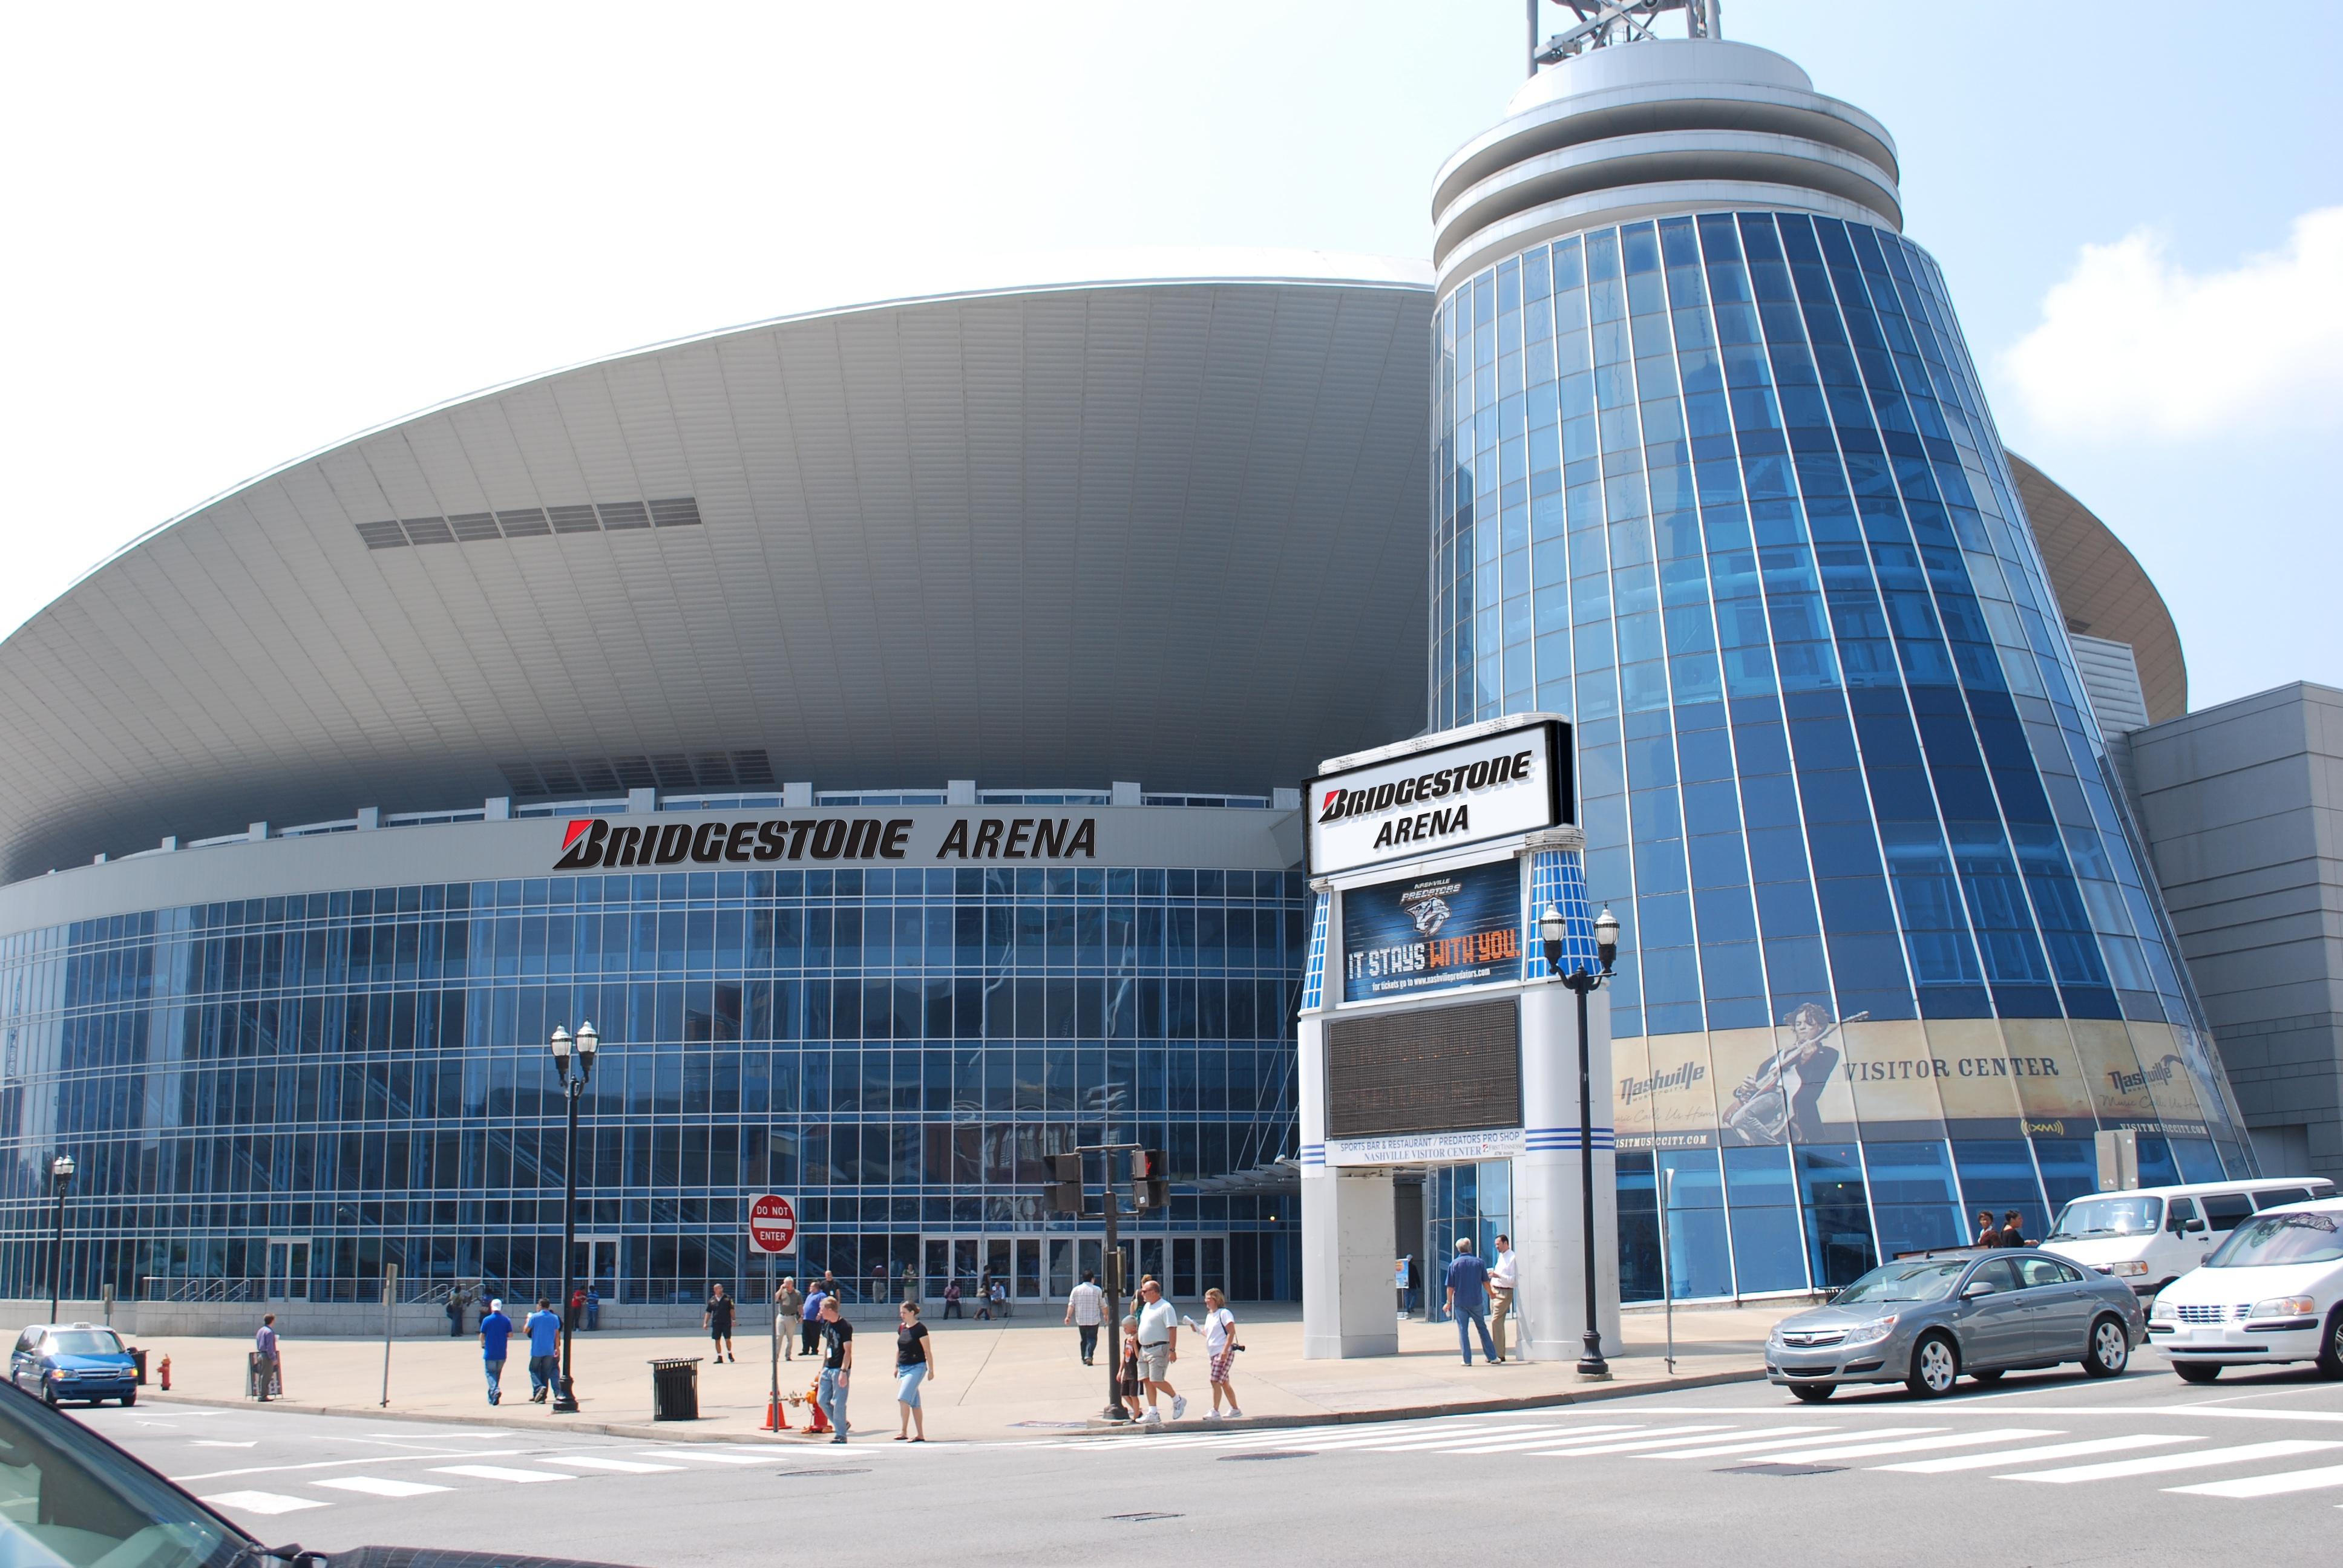 <a href='http://www.ticketsreview.com/bridgestone-arena.html'>Bridgestone Arena tickets</a>